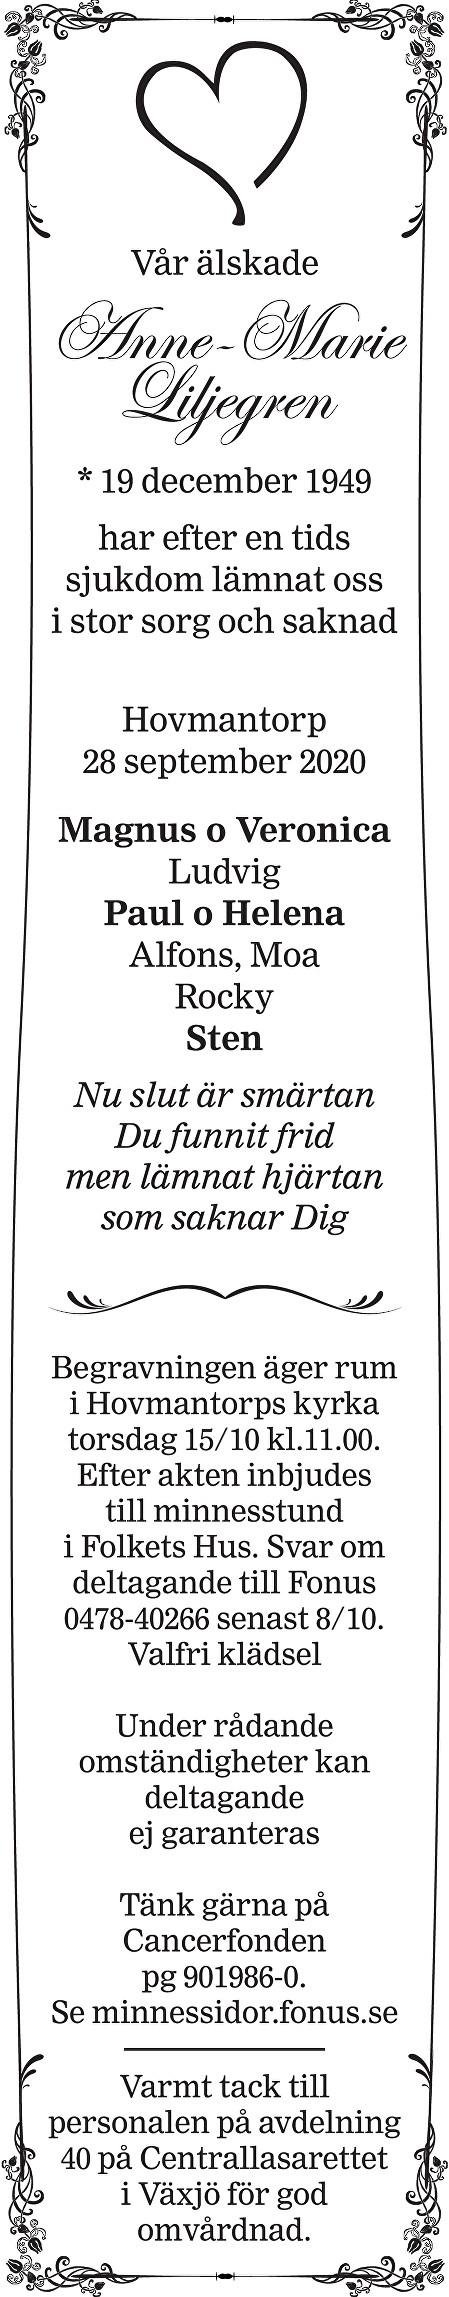 Anne-Marie Liljegren Death notice